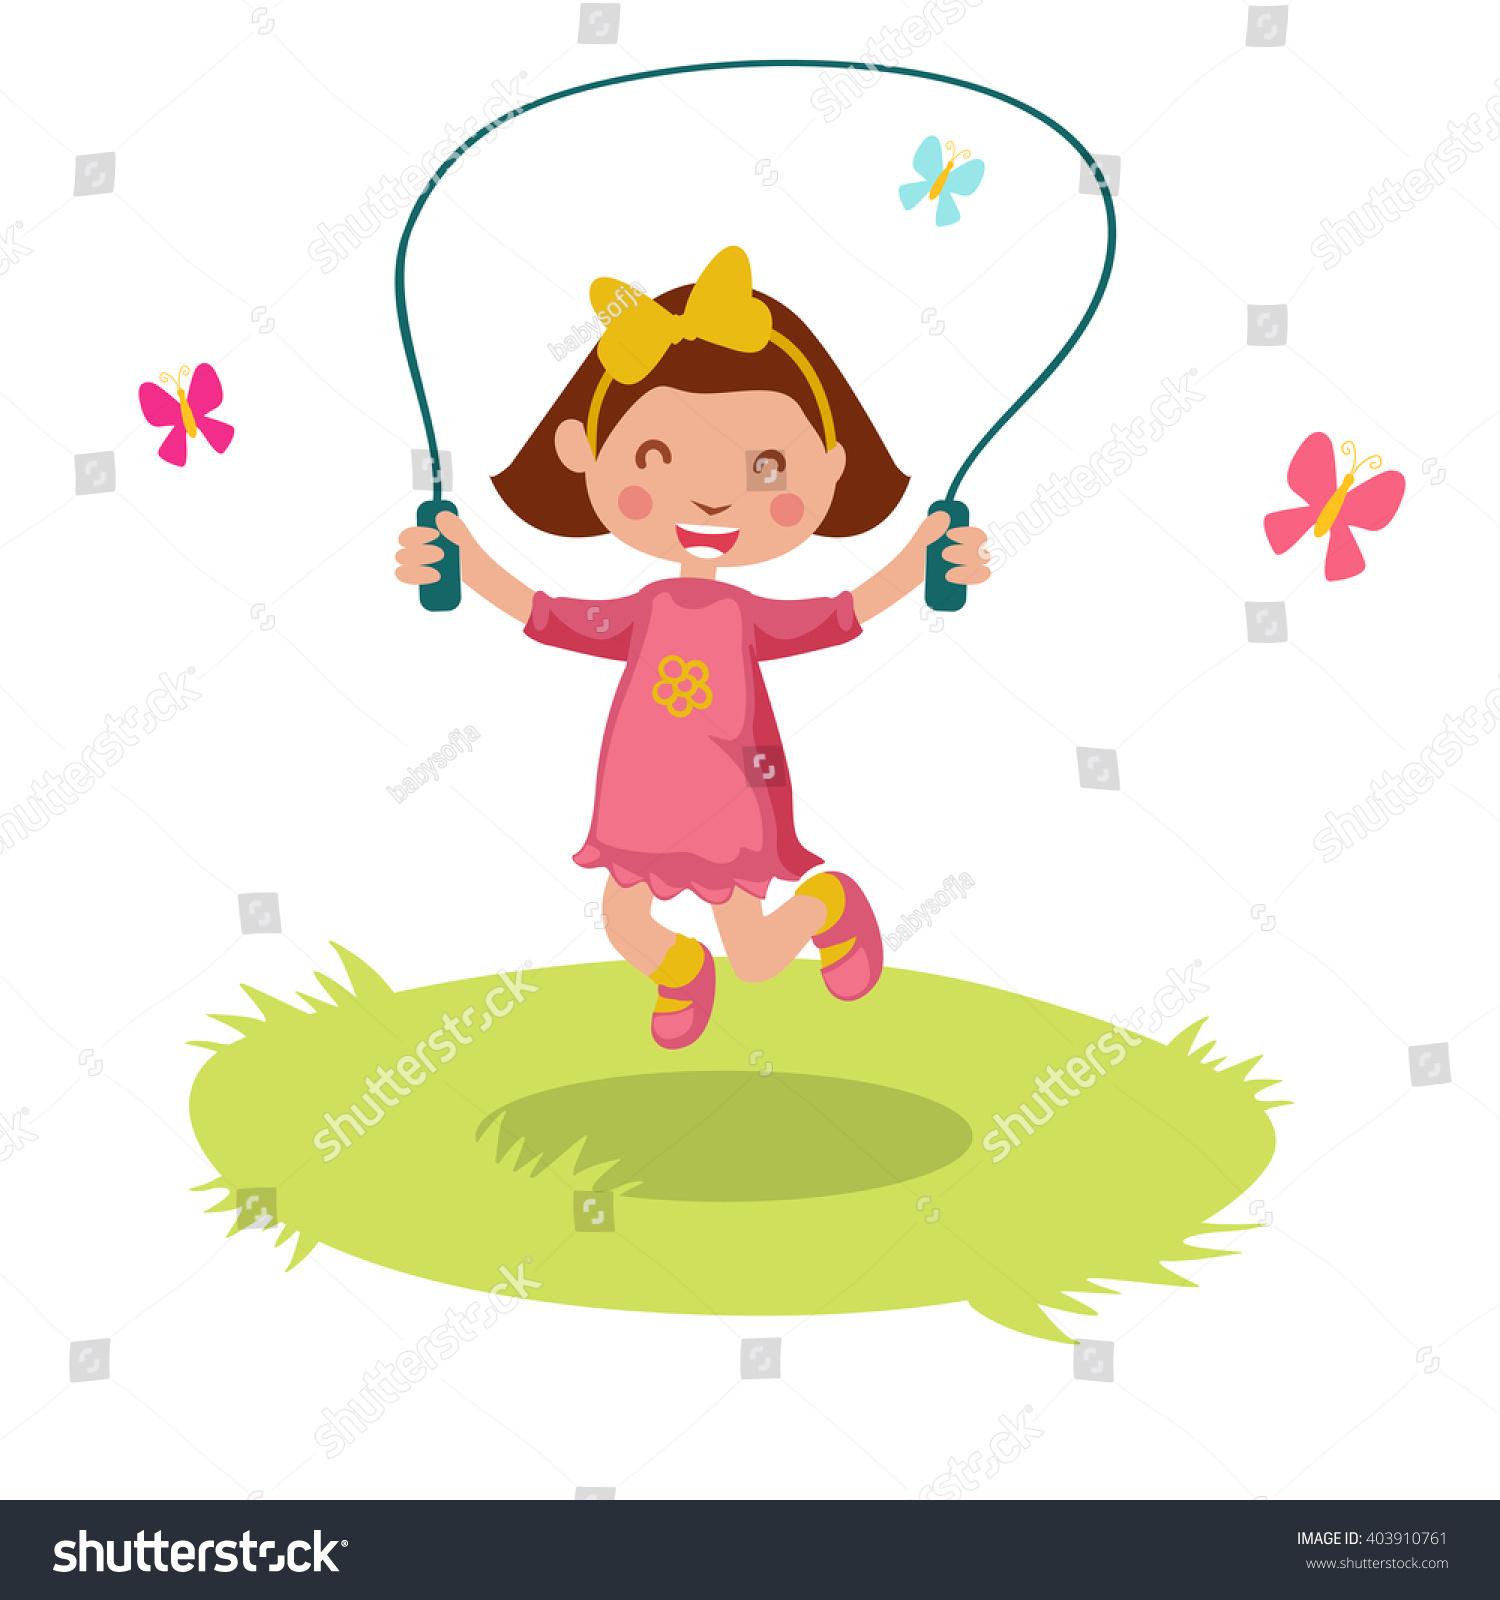 Little Cartoon Girl Skipping Rope Vector Stock Vector 403910761 - Shutterstock